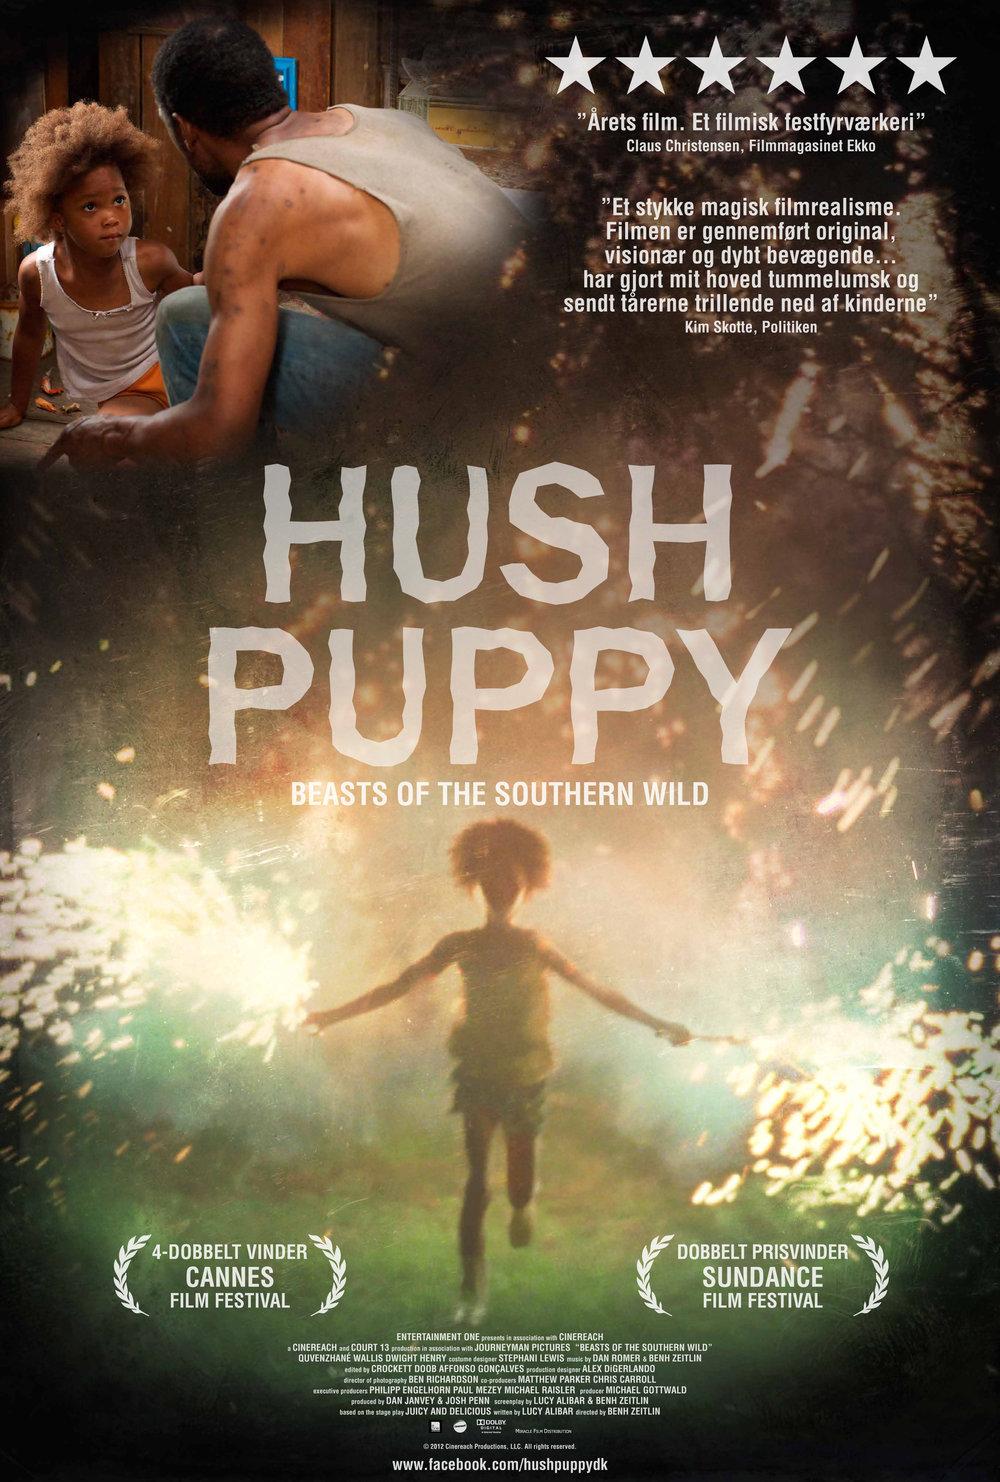 12.391 hushpuppy plakat 685x1015.jpg